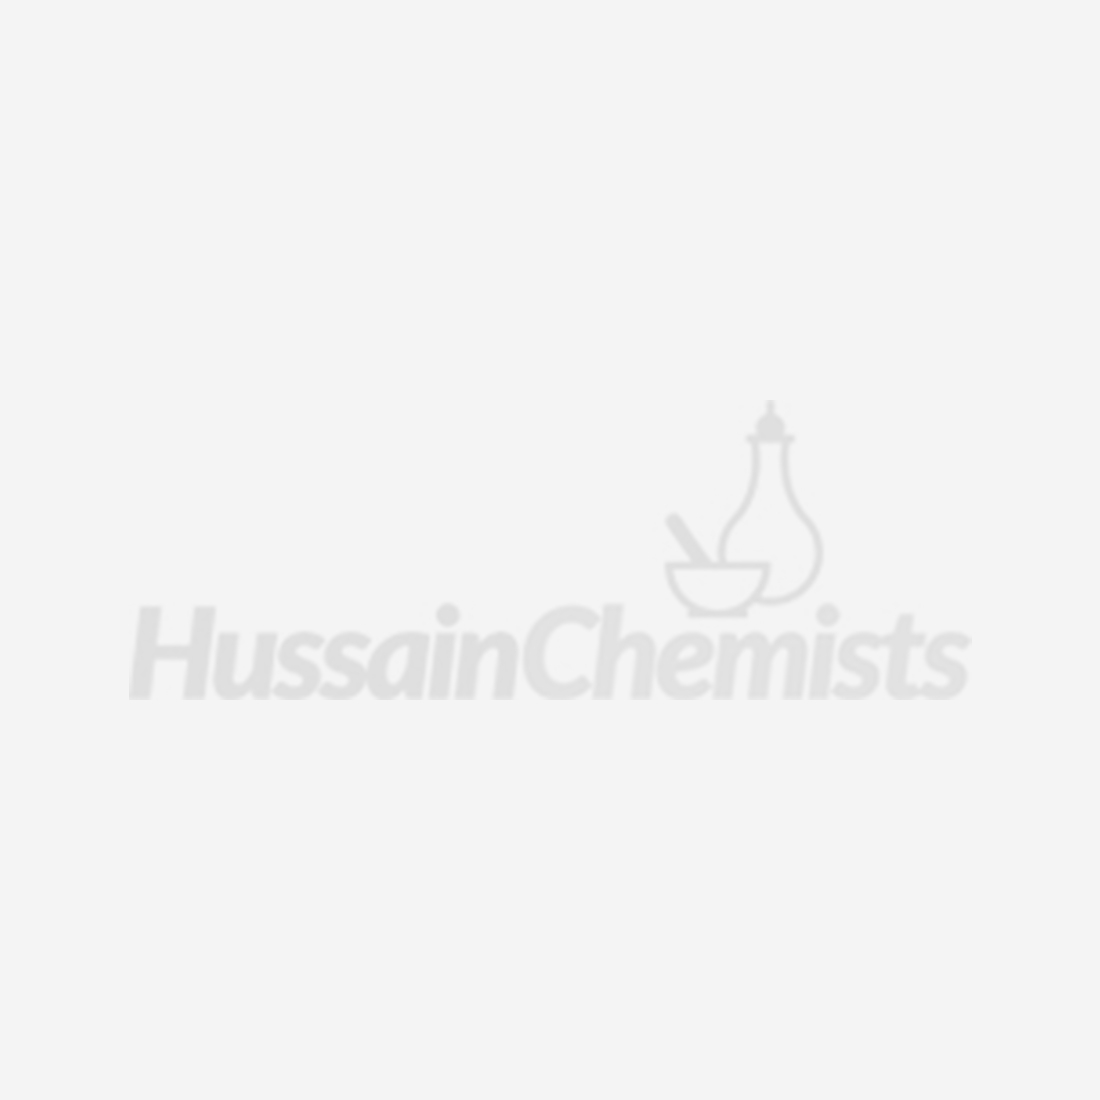 Solpadeine Plus Soluble Tablets - 16